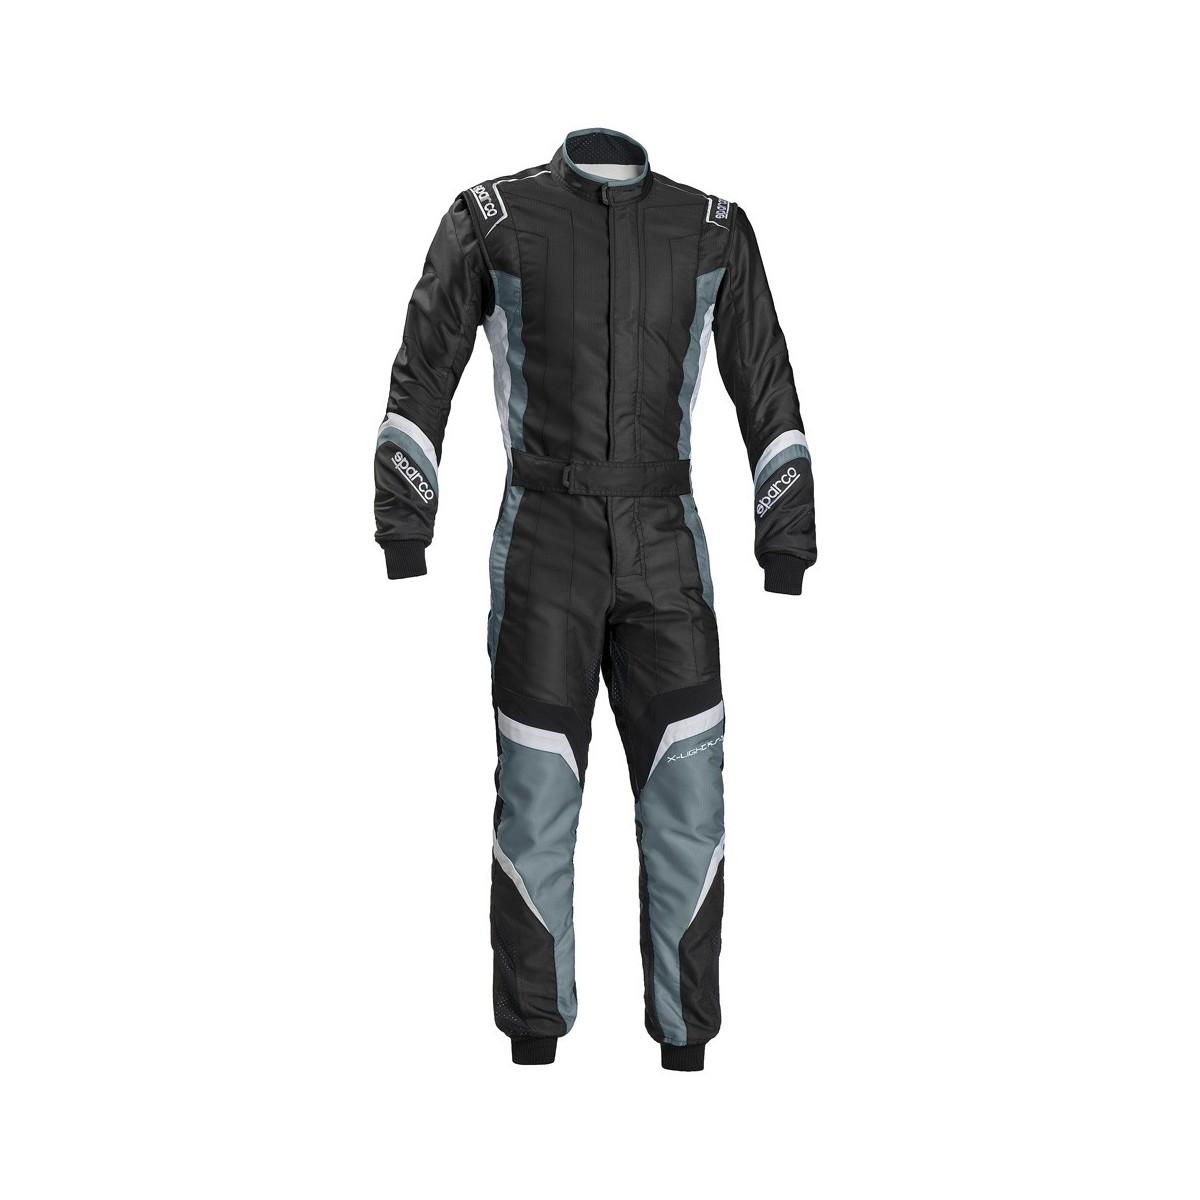 002336 Sparco X-Light KS-7 Kart Racing Suit